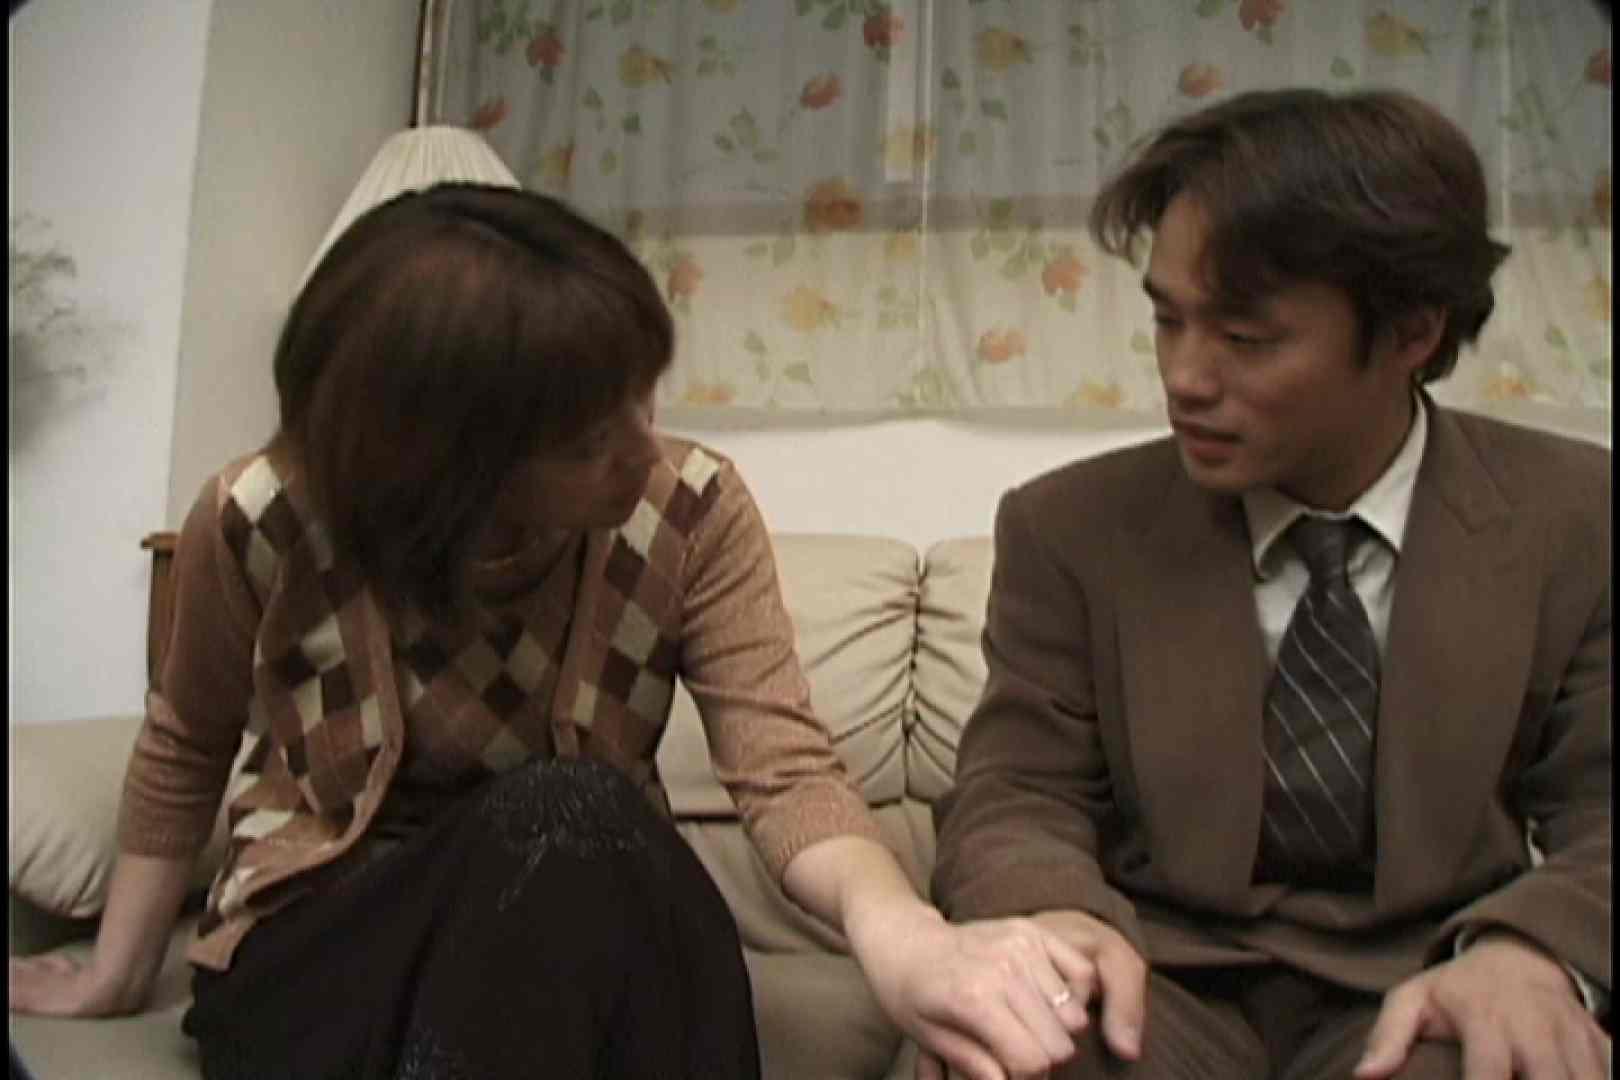 昼間の奥様は欲求不満 ~石川麻紀~ 熟女  69枚 16